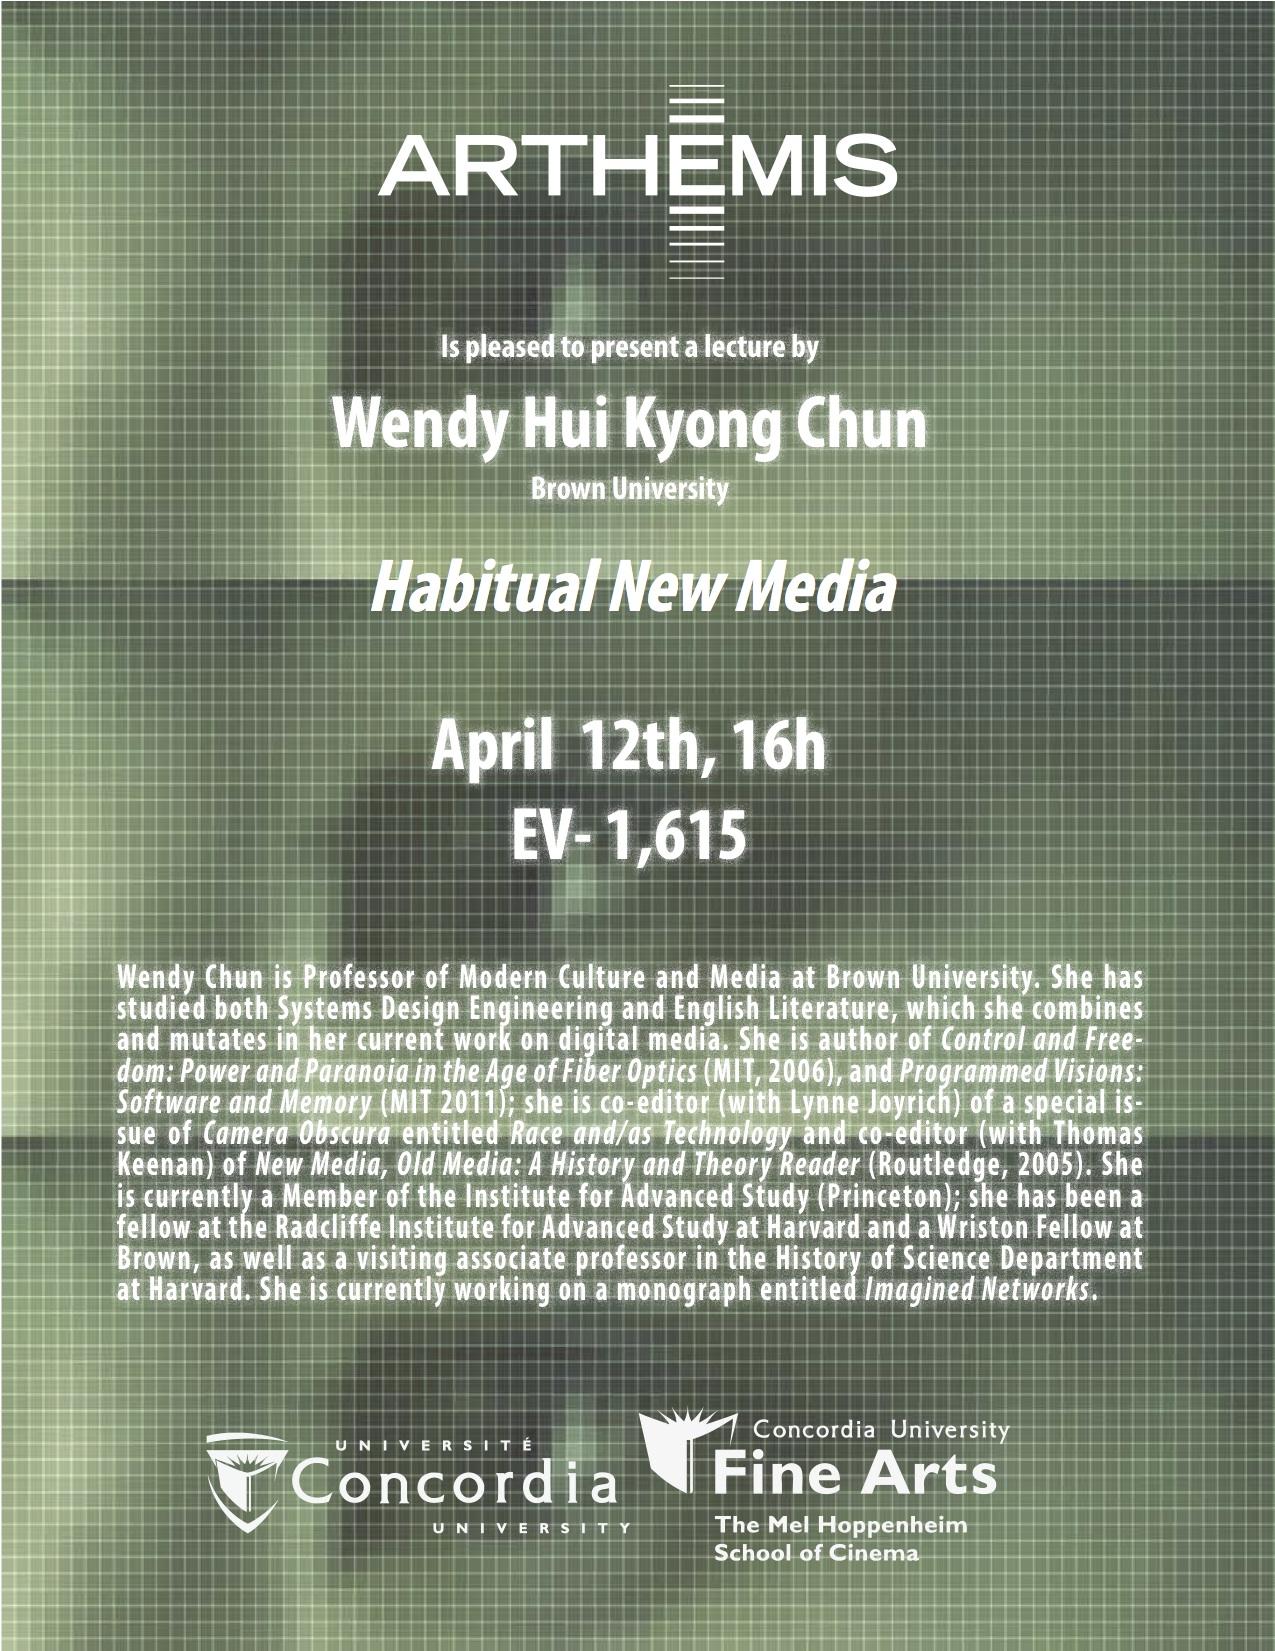 WendyChun's webadd